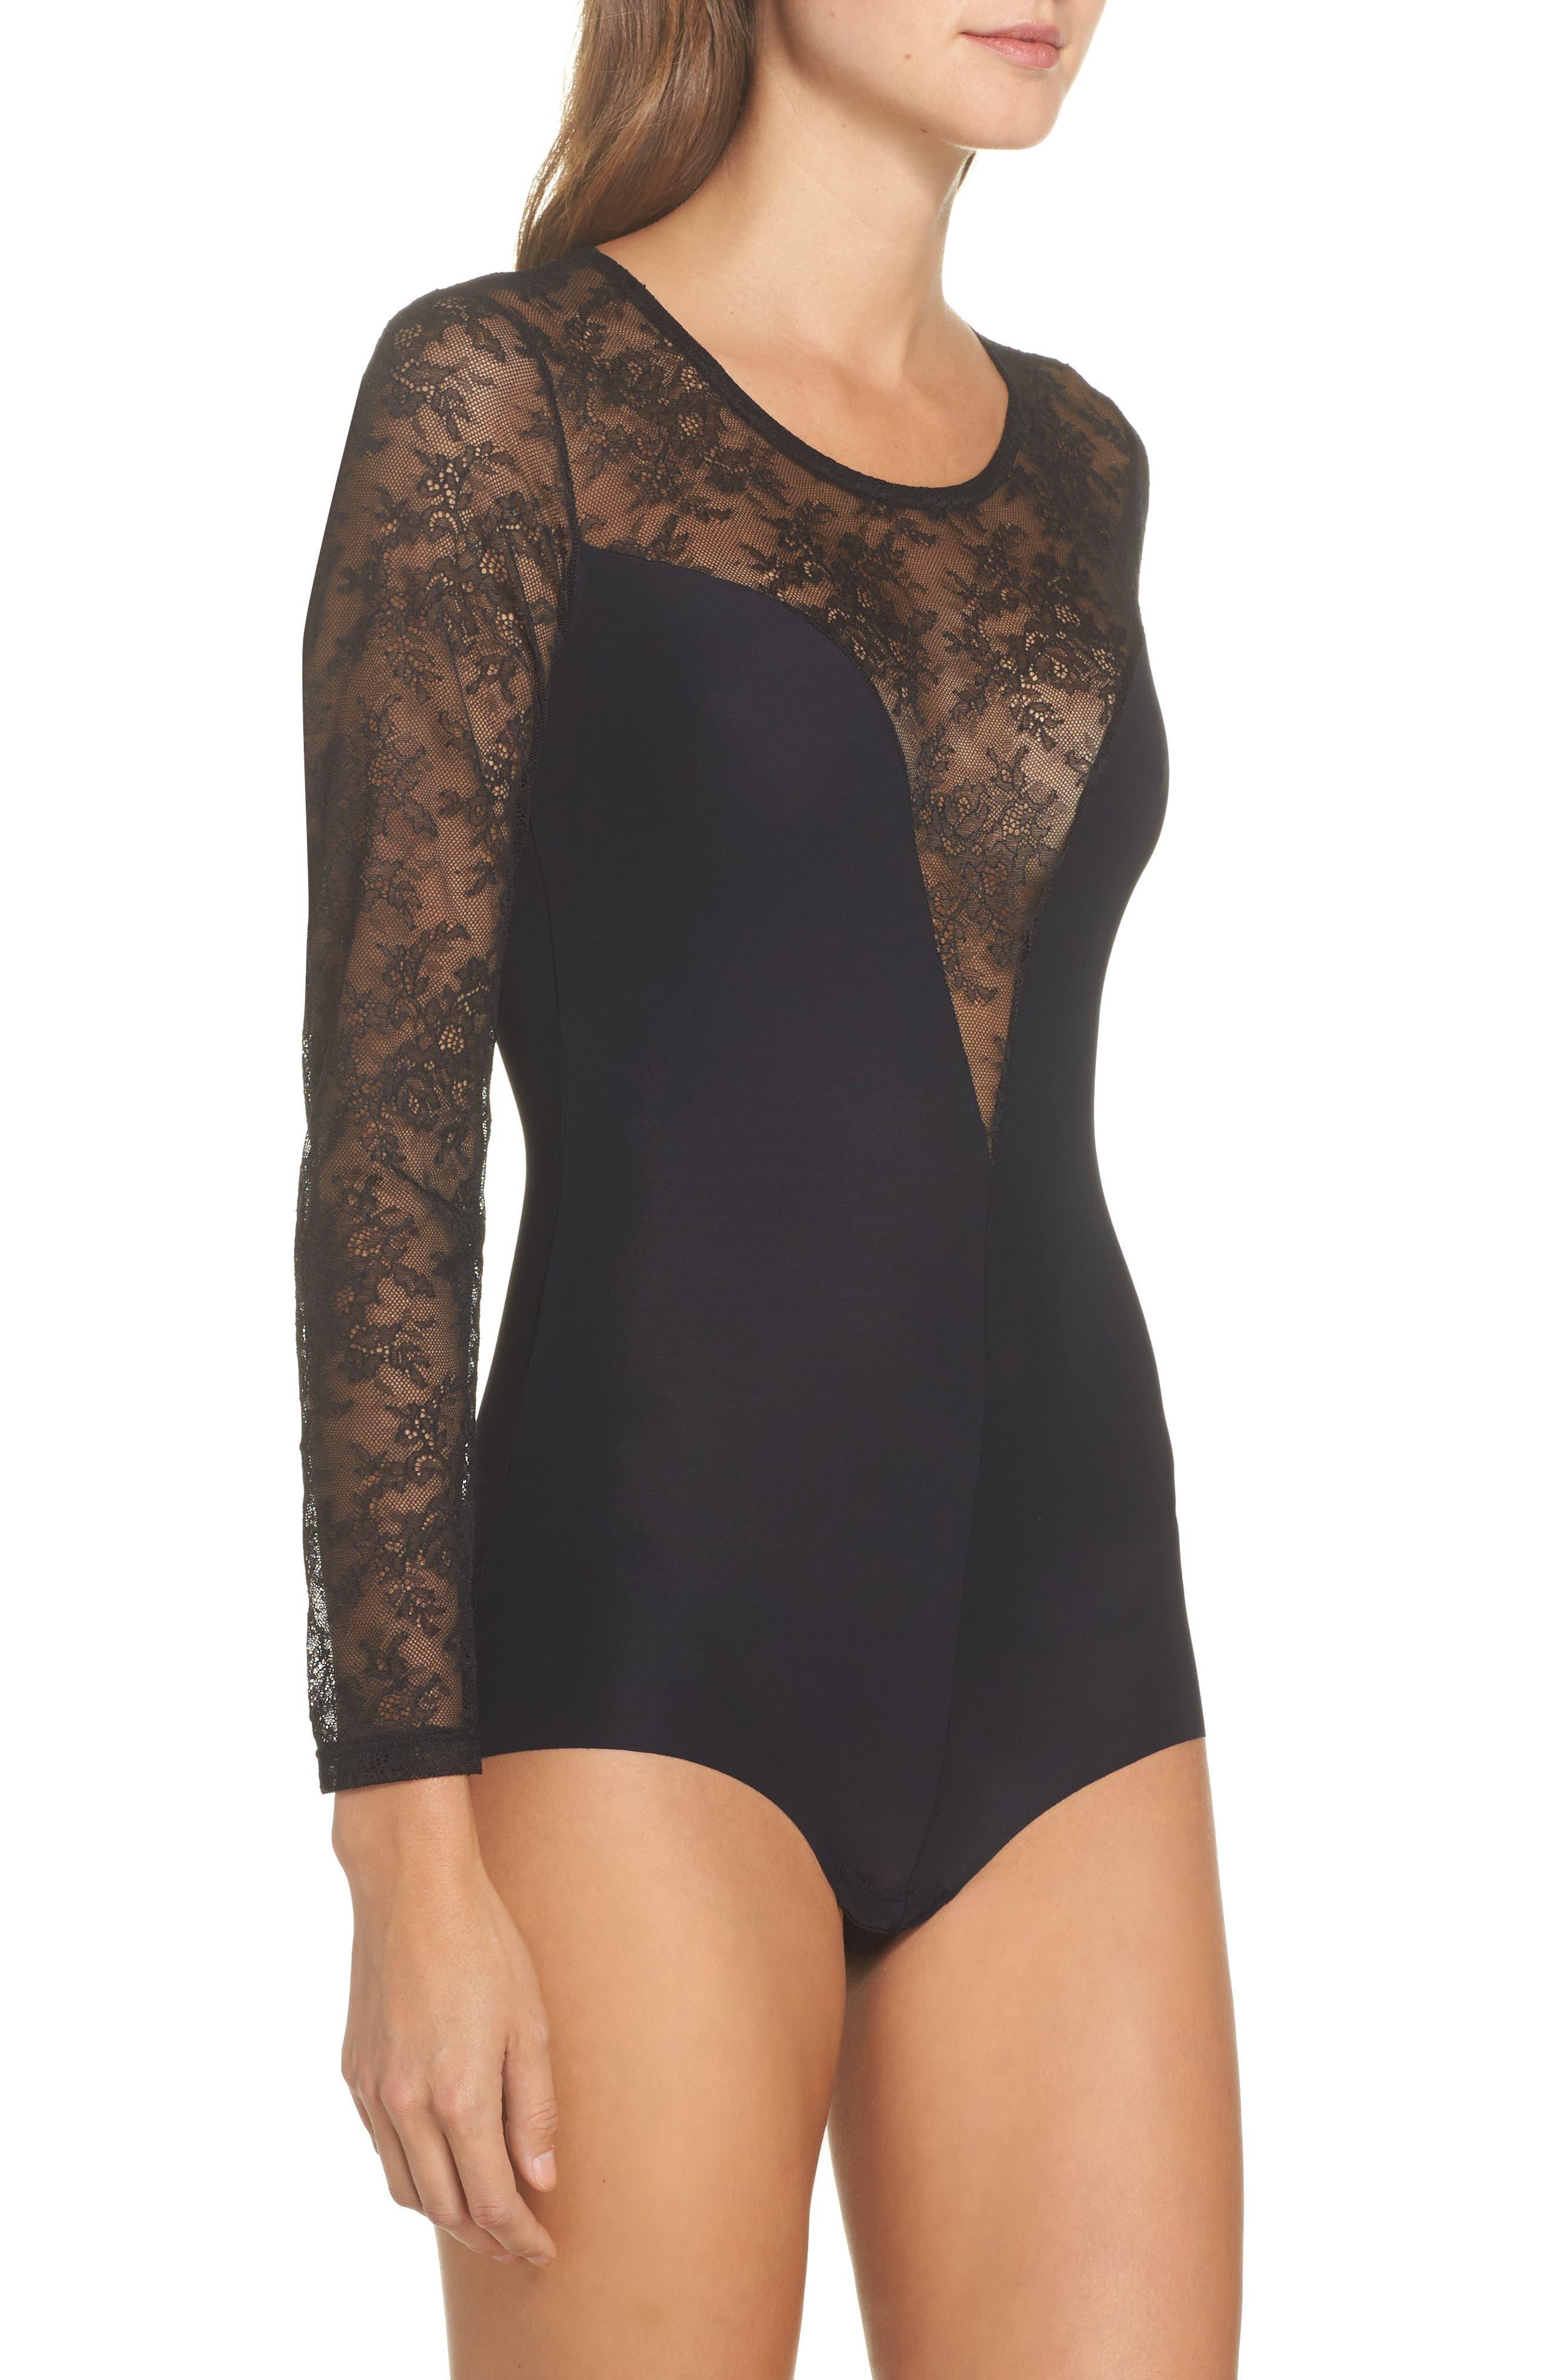 Odette Bodysuit,                             Alternate thumbnail 3, color,                             Black